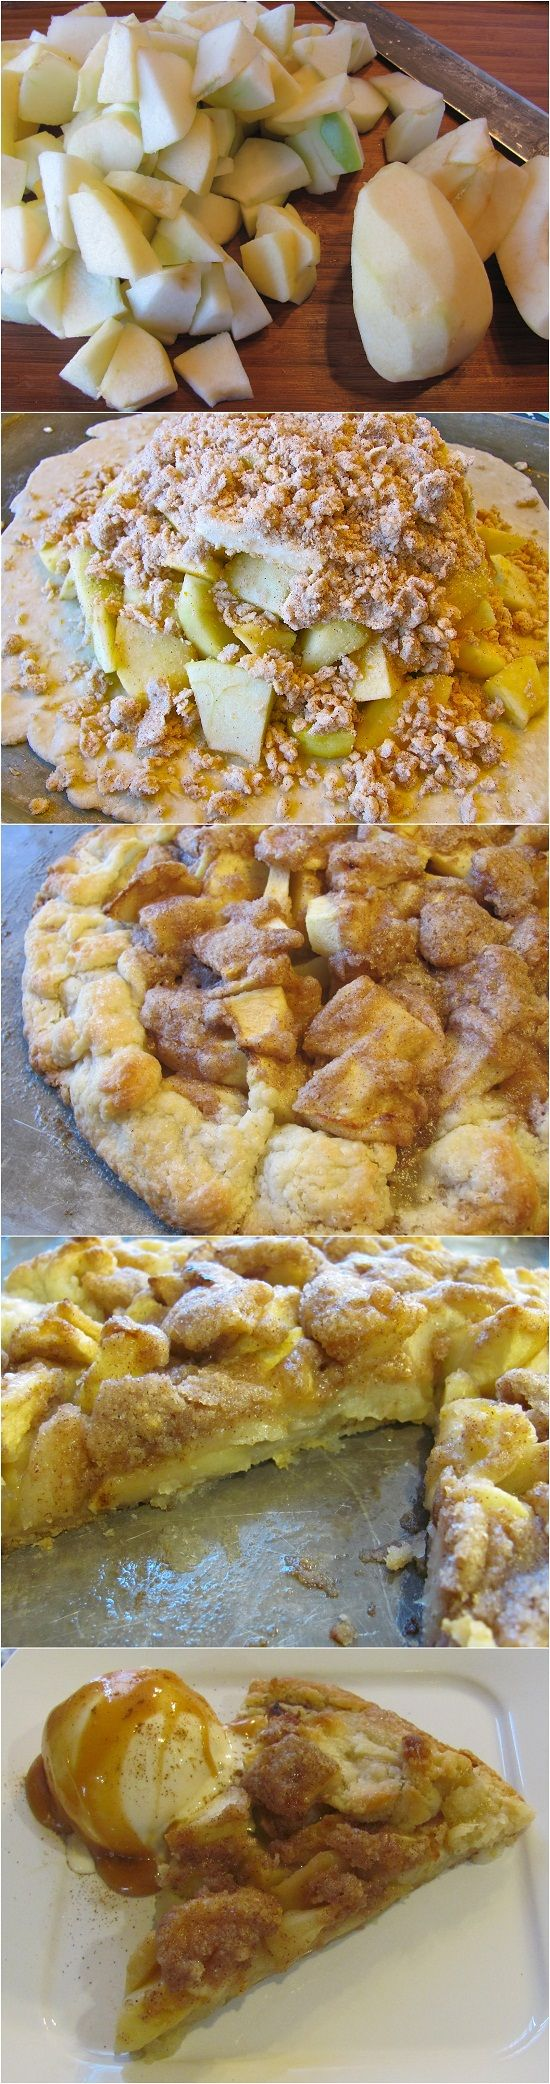 Crostata de manzana